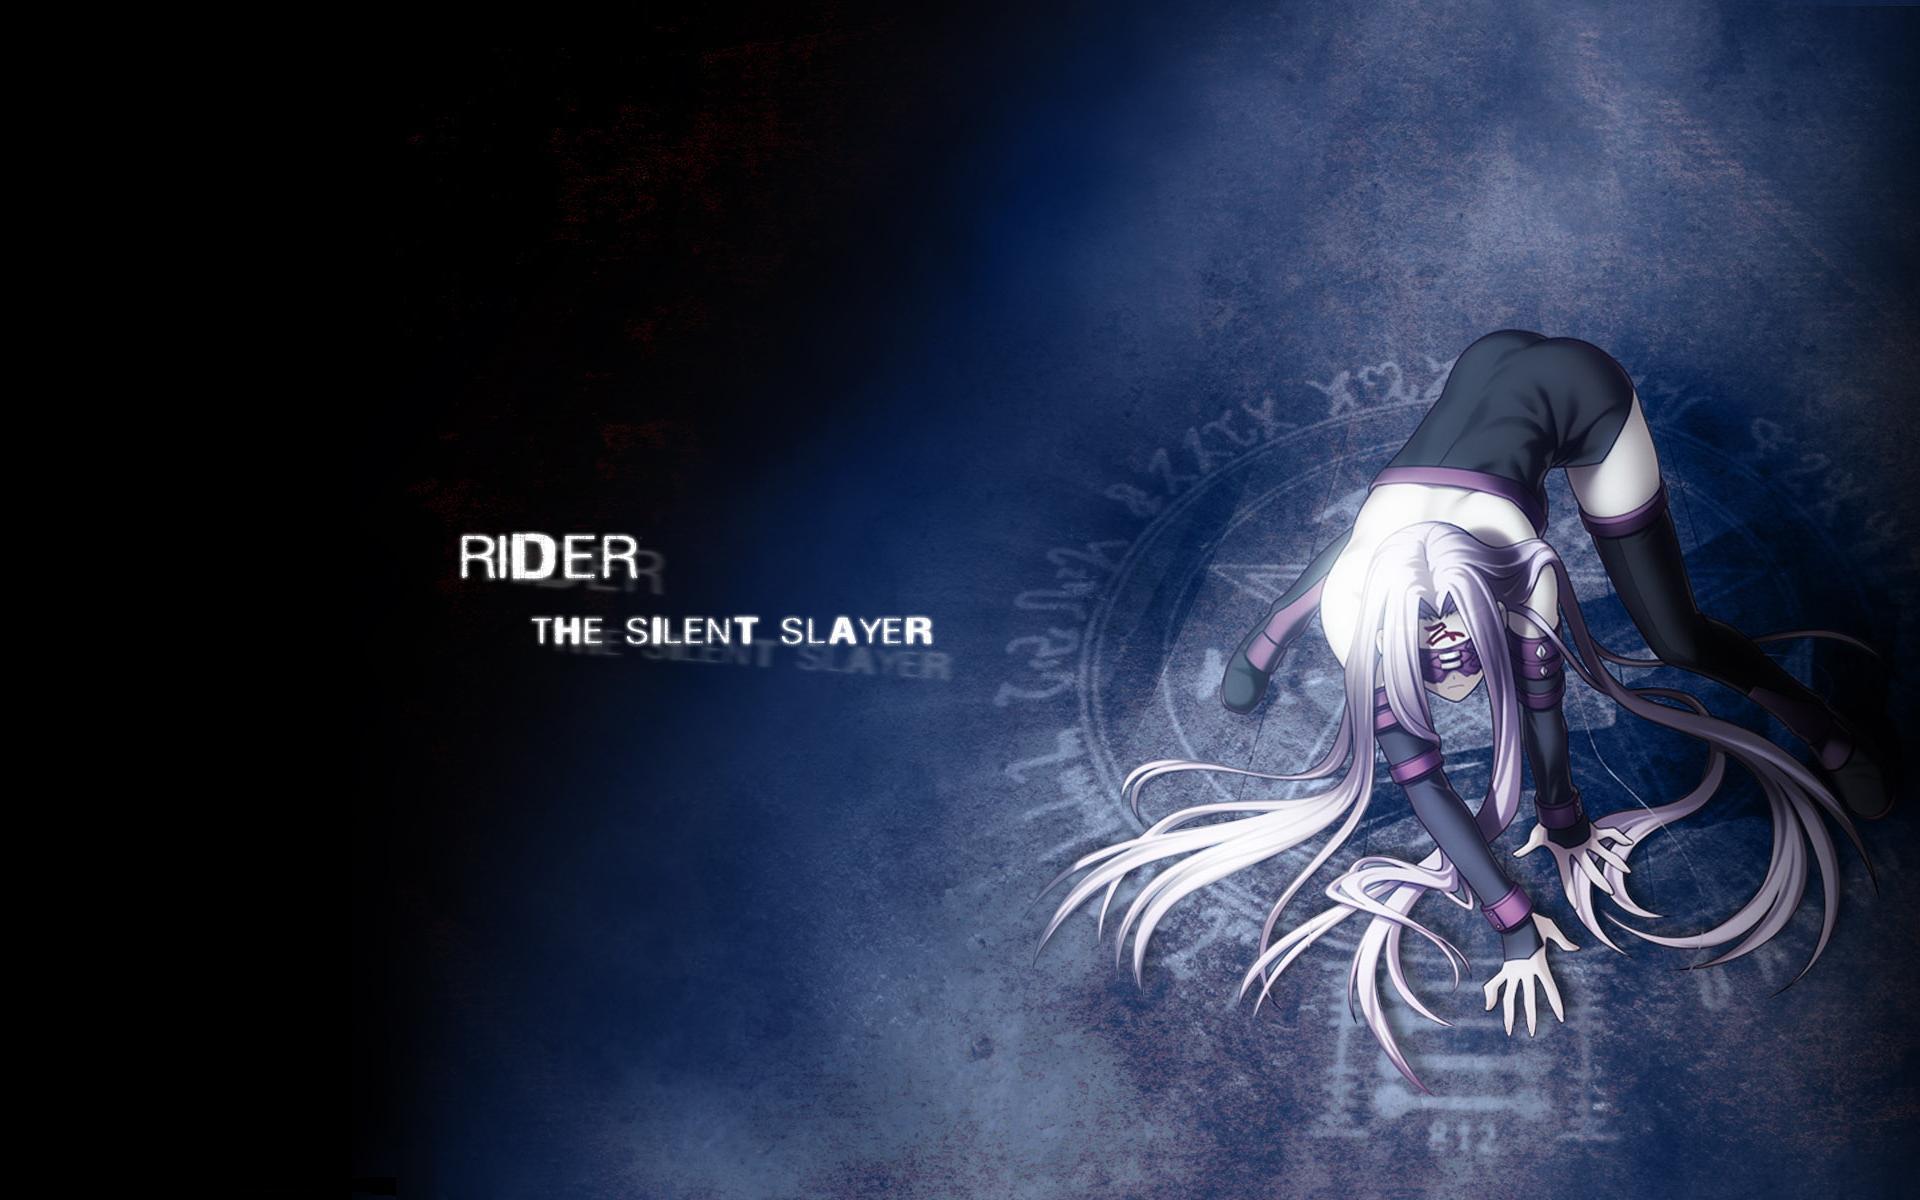 Anime - Fate/Stay Night  Rider (Fate/stay Night) Wallpaper